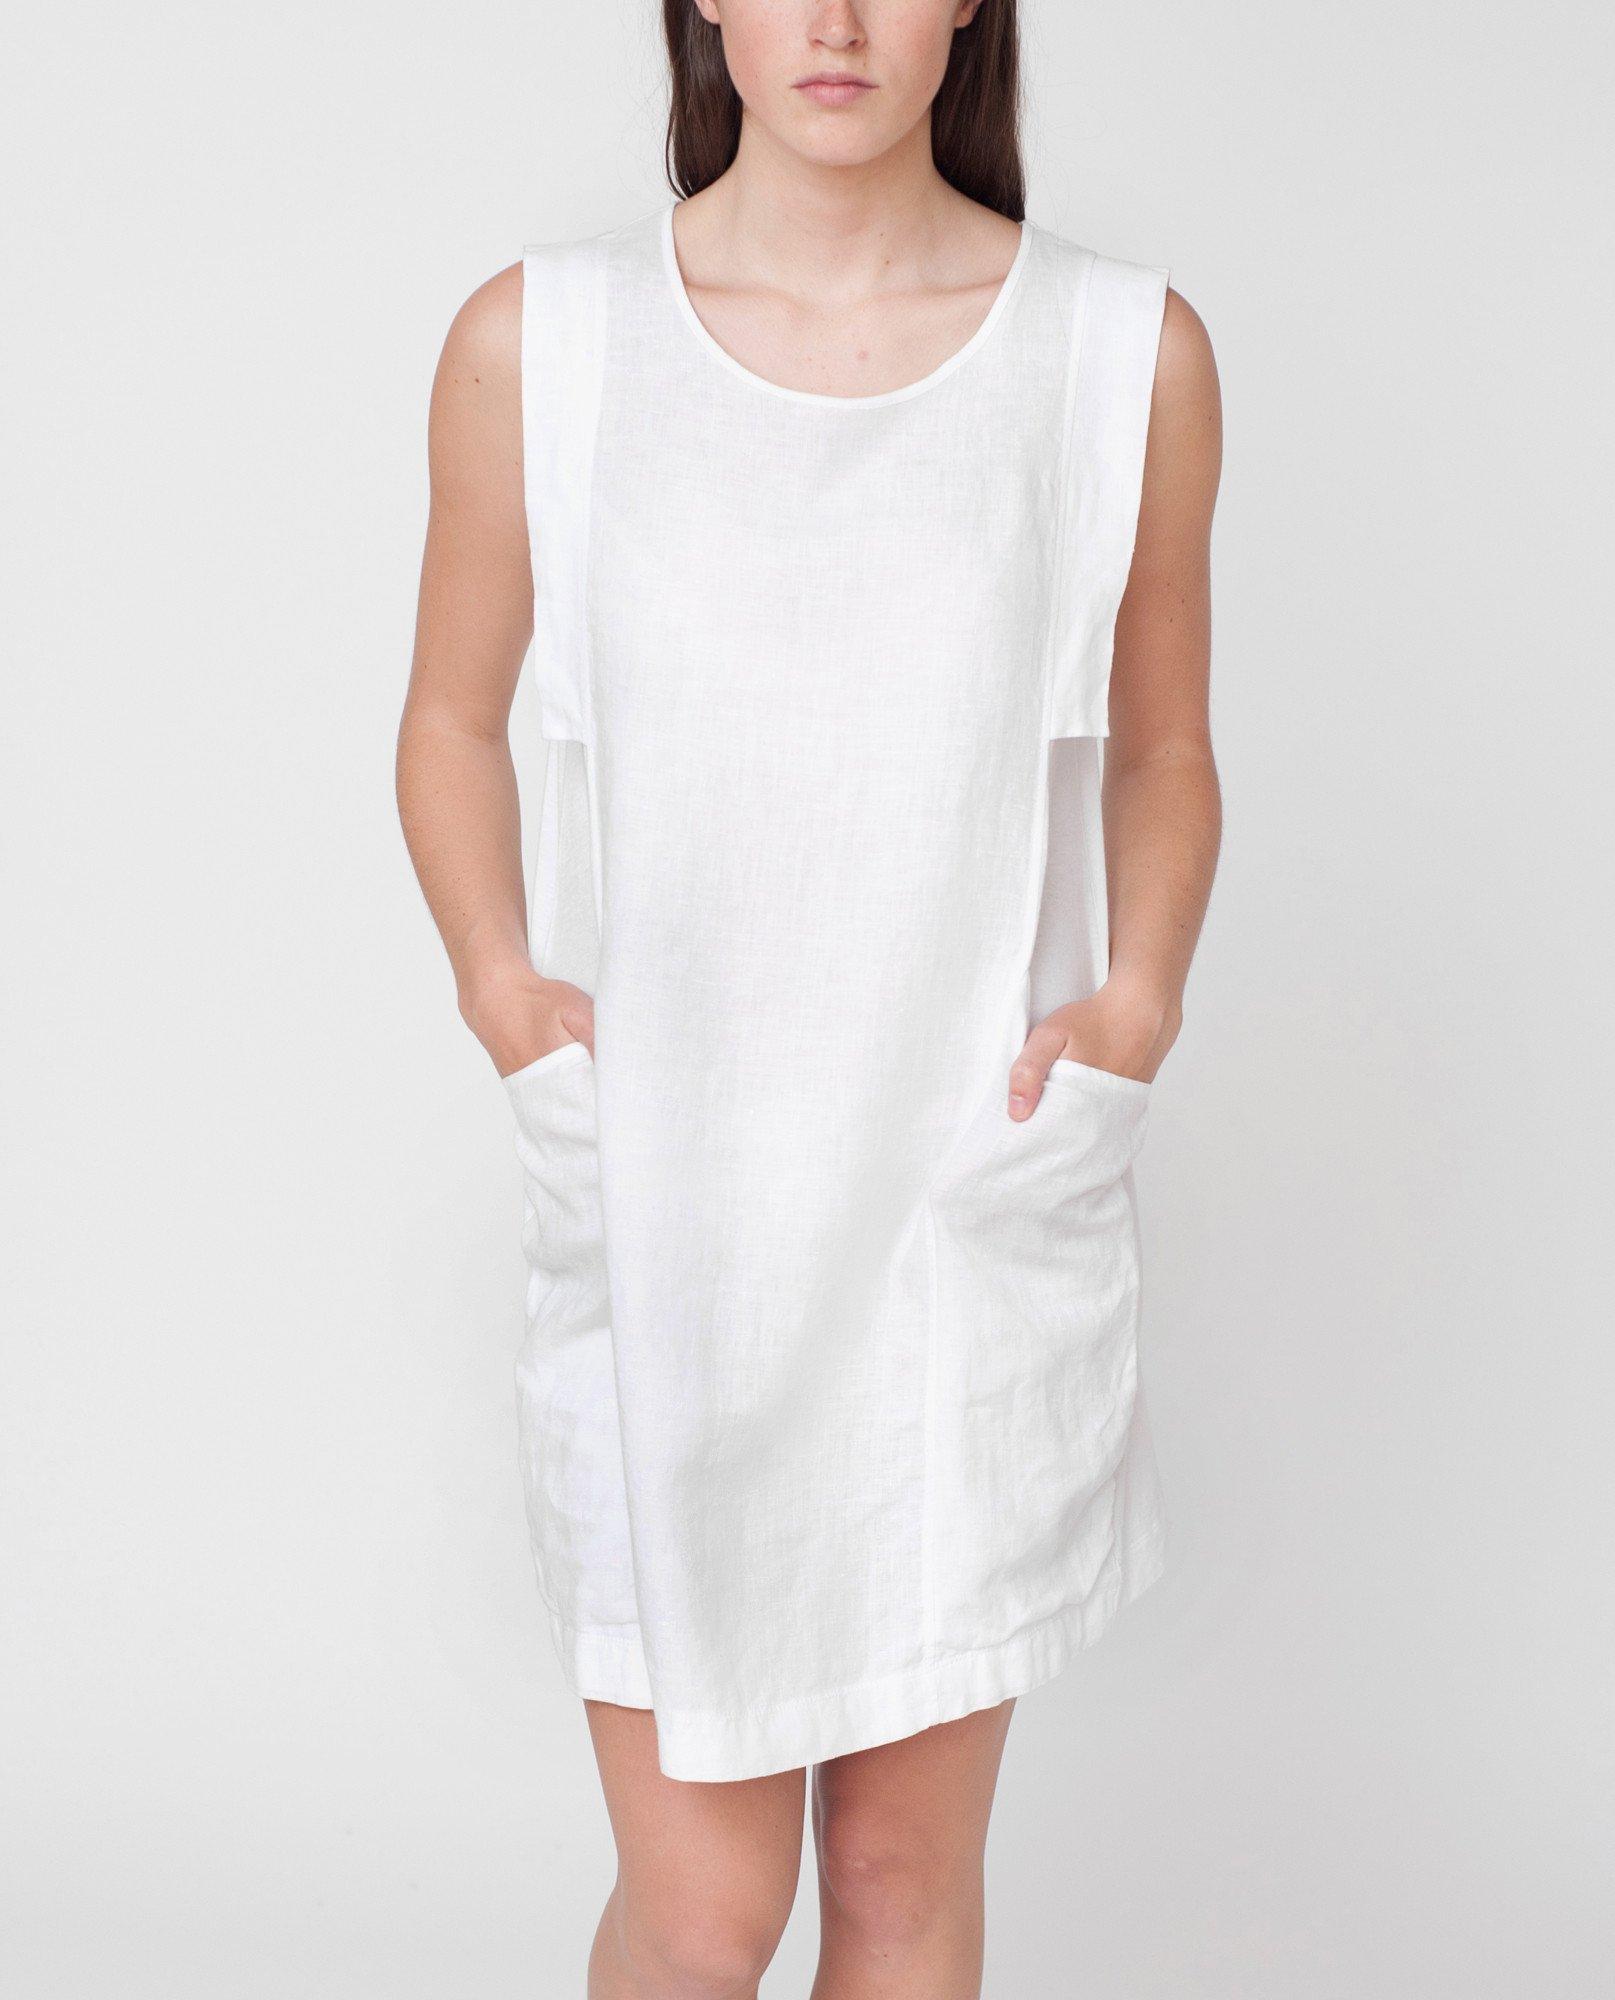 JESS Organic Cotton And Linen Dress from Beaumont Organic